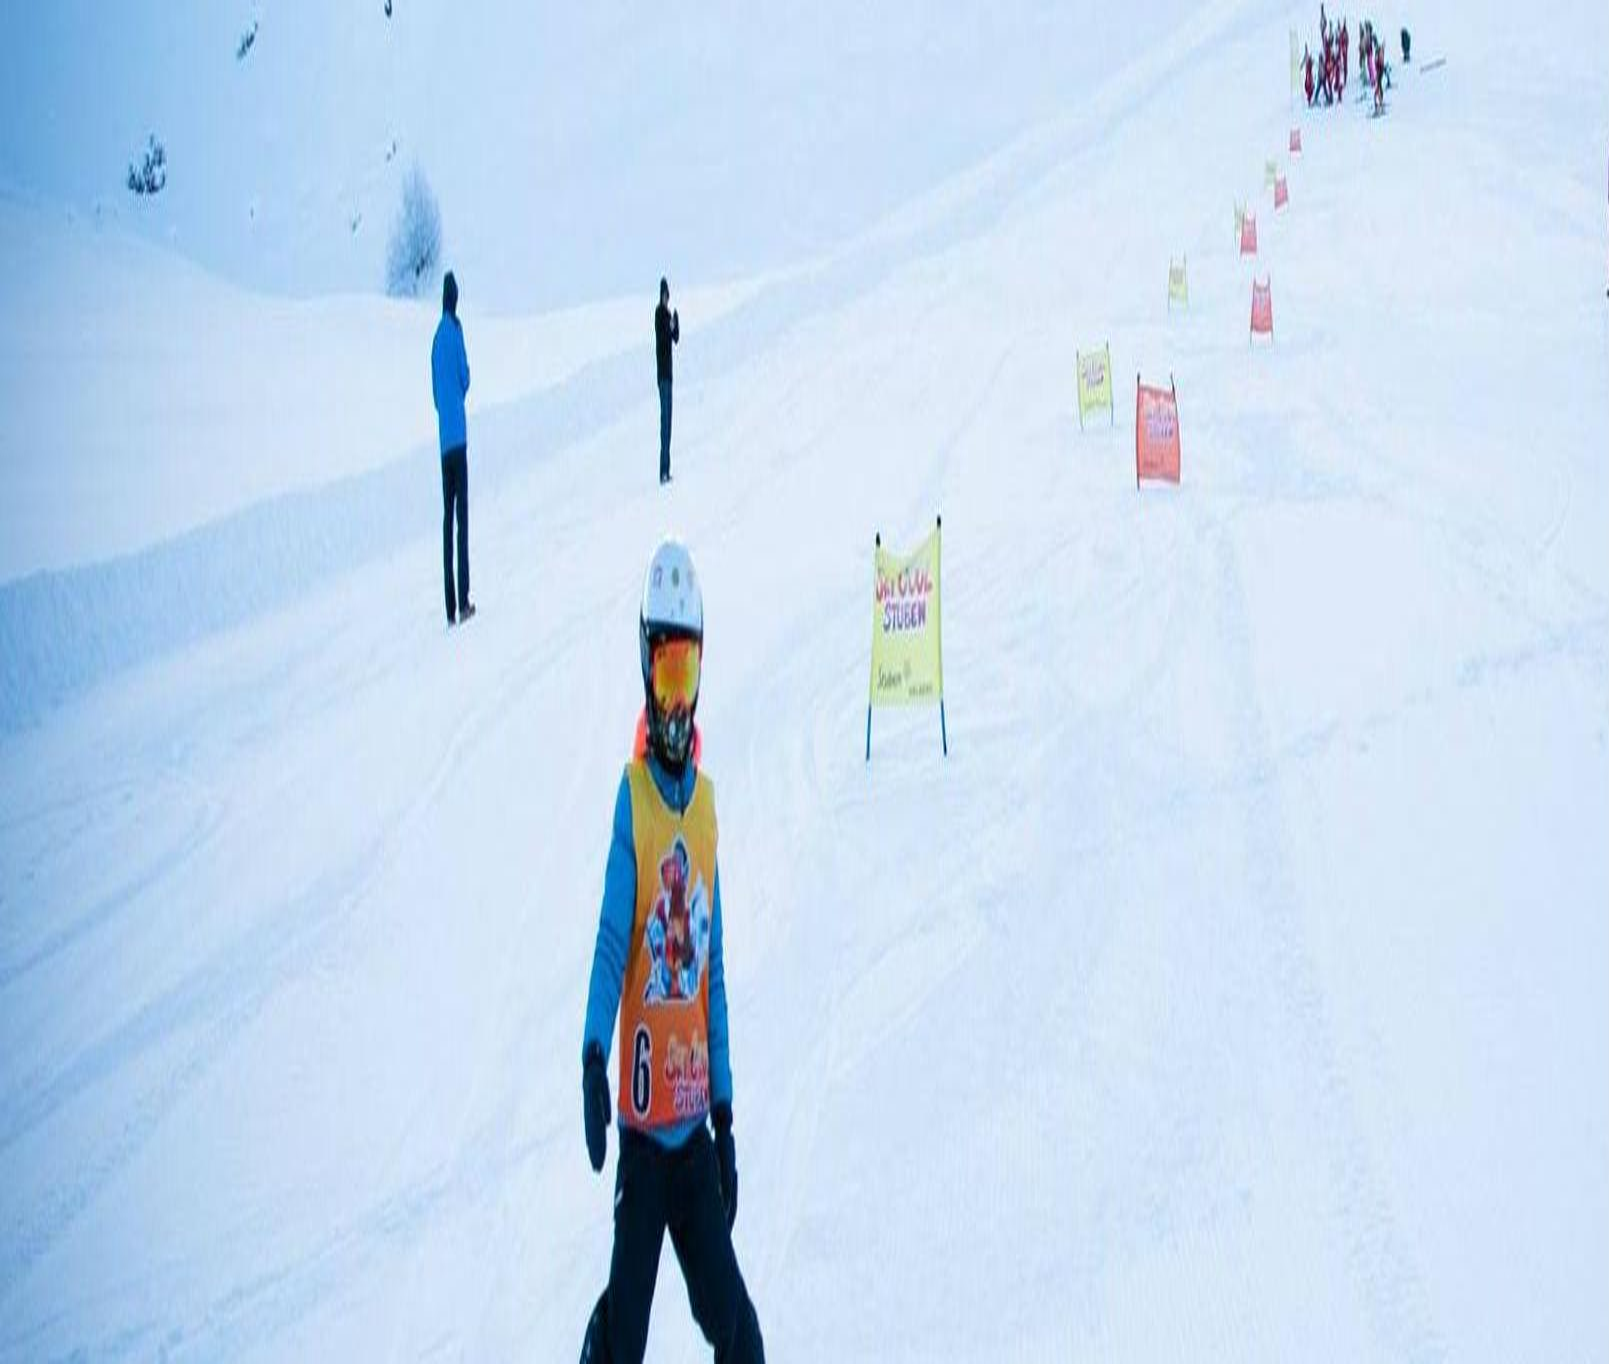 Ski Instructor Private for Kids in Stuben - All Ages